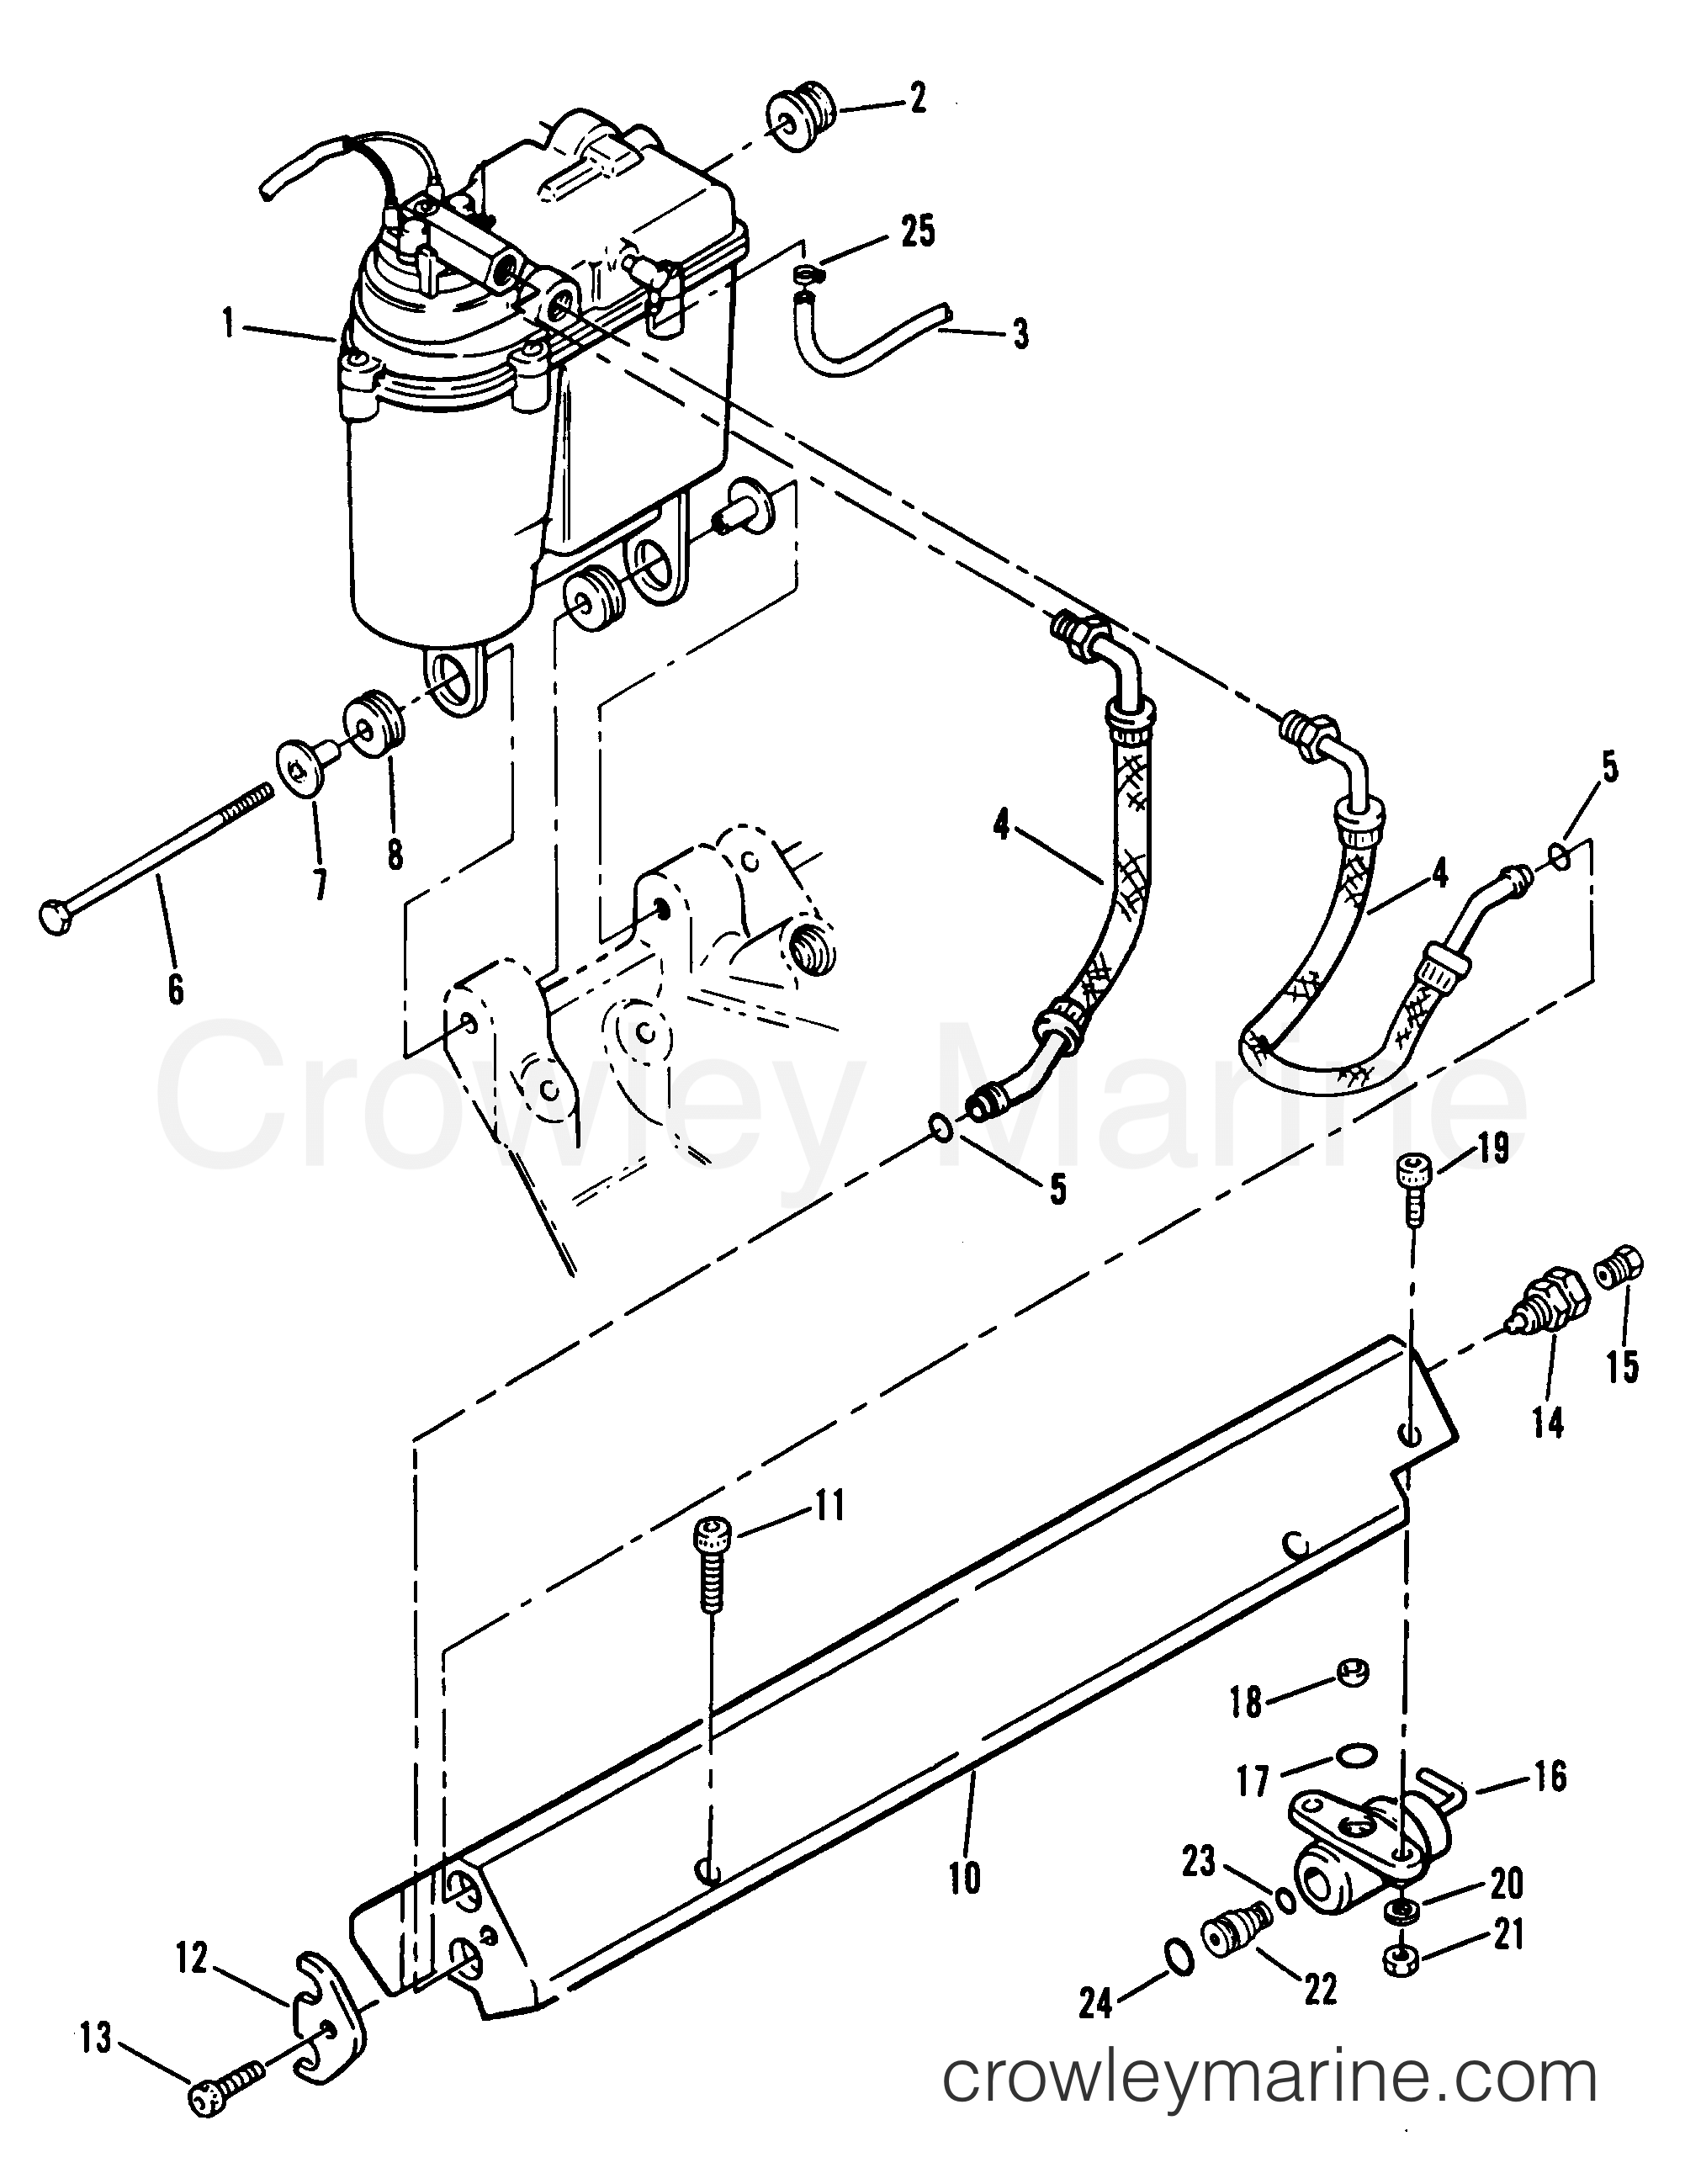 Vapor Separator Tank And Fuel Rail 1994 Mercury Inboard Engine Evinrude 175 Wiring Diagrams 454ski Efi Mp 374b169gs